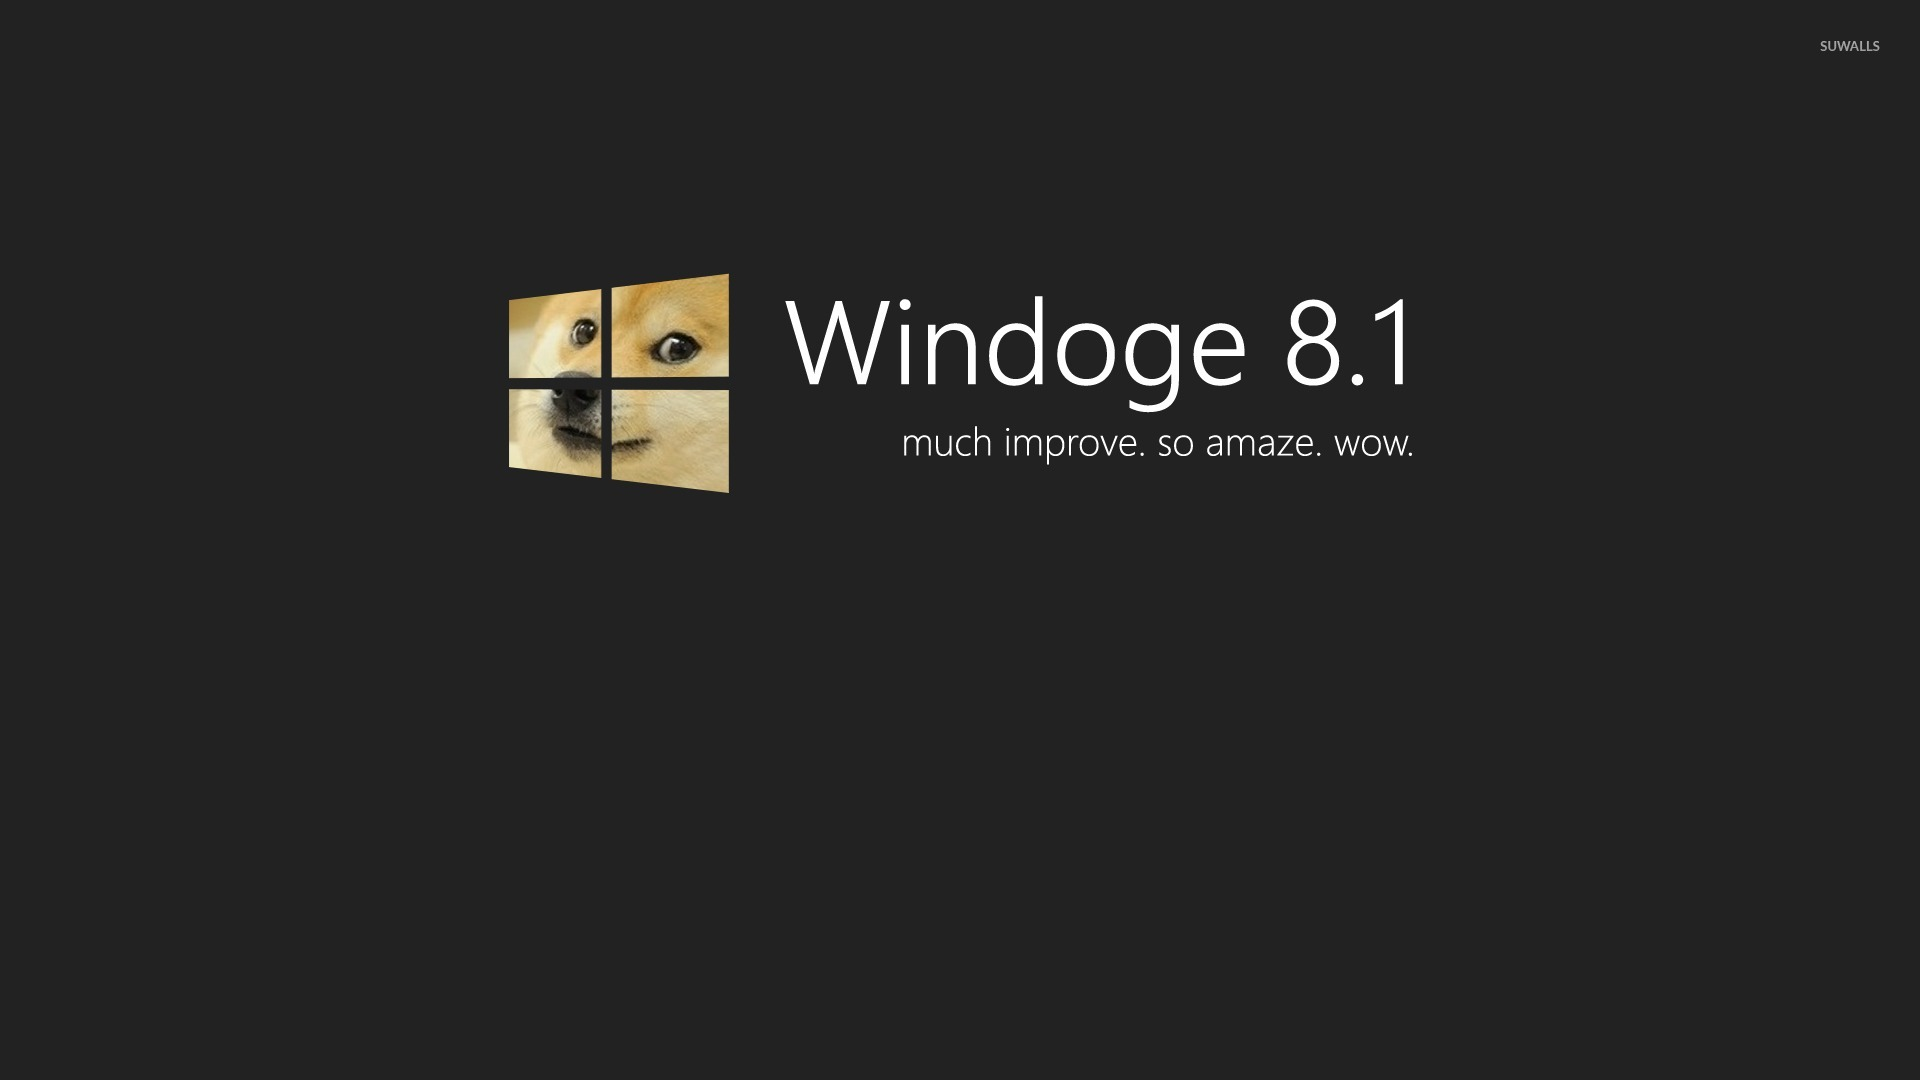 Doge Windows 8 1 Wallpaper Computer Wallpapers 27993